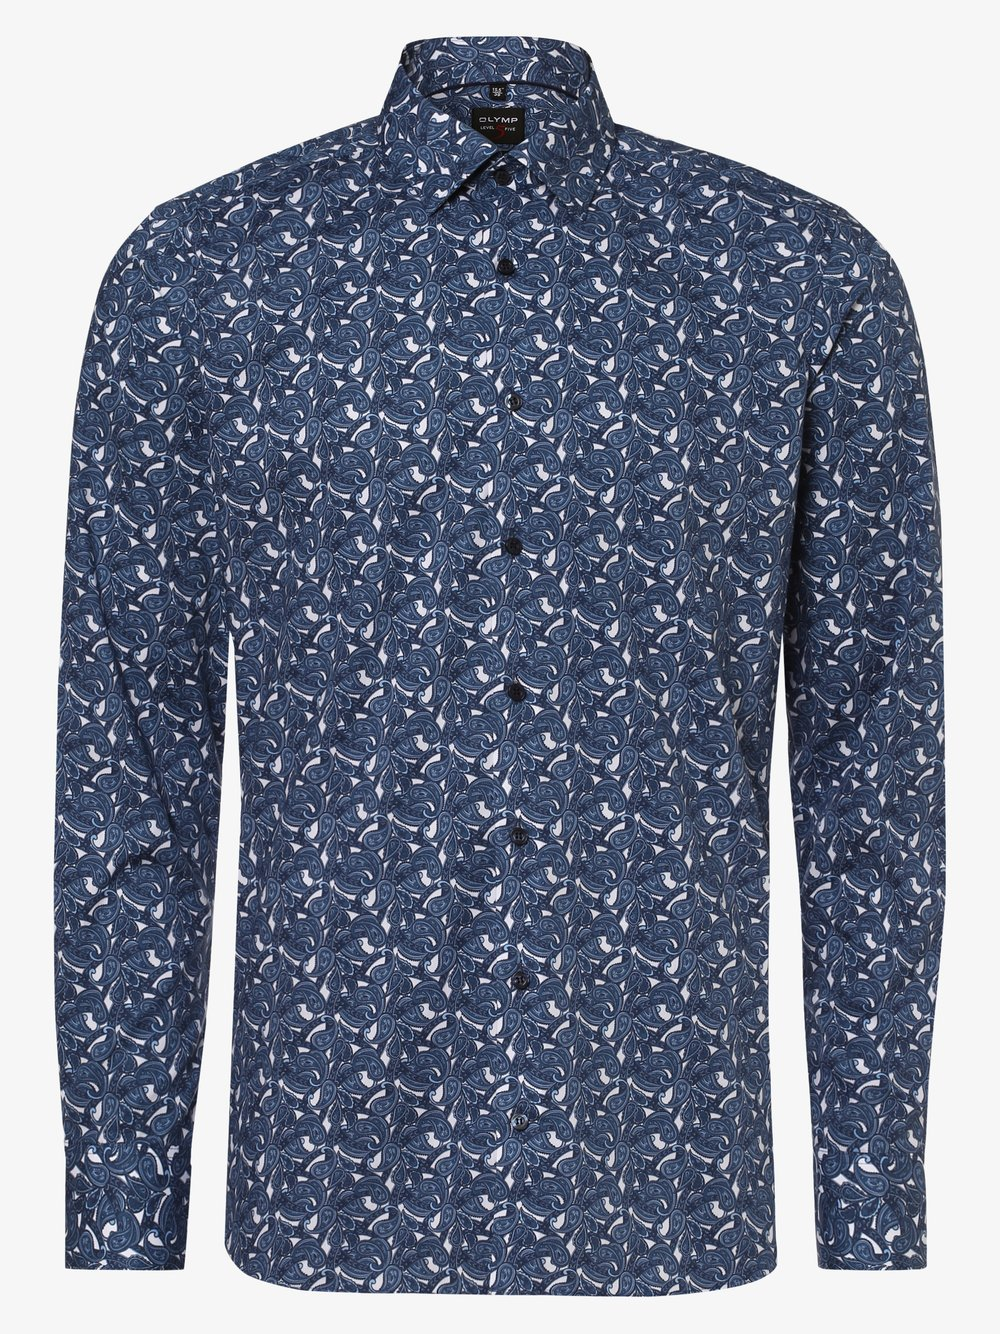 Olymp Level Five – Koszula męska łatwa w prasowaniu, niebieski Van Graaf 442117-0001-00380